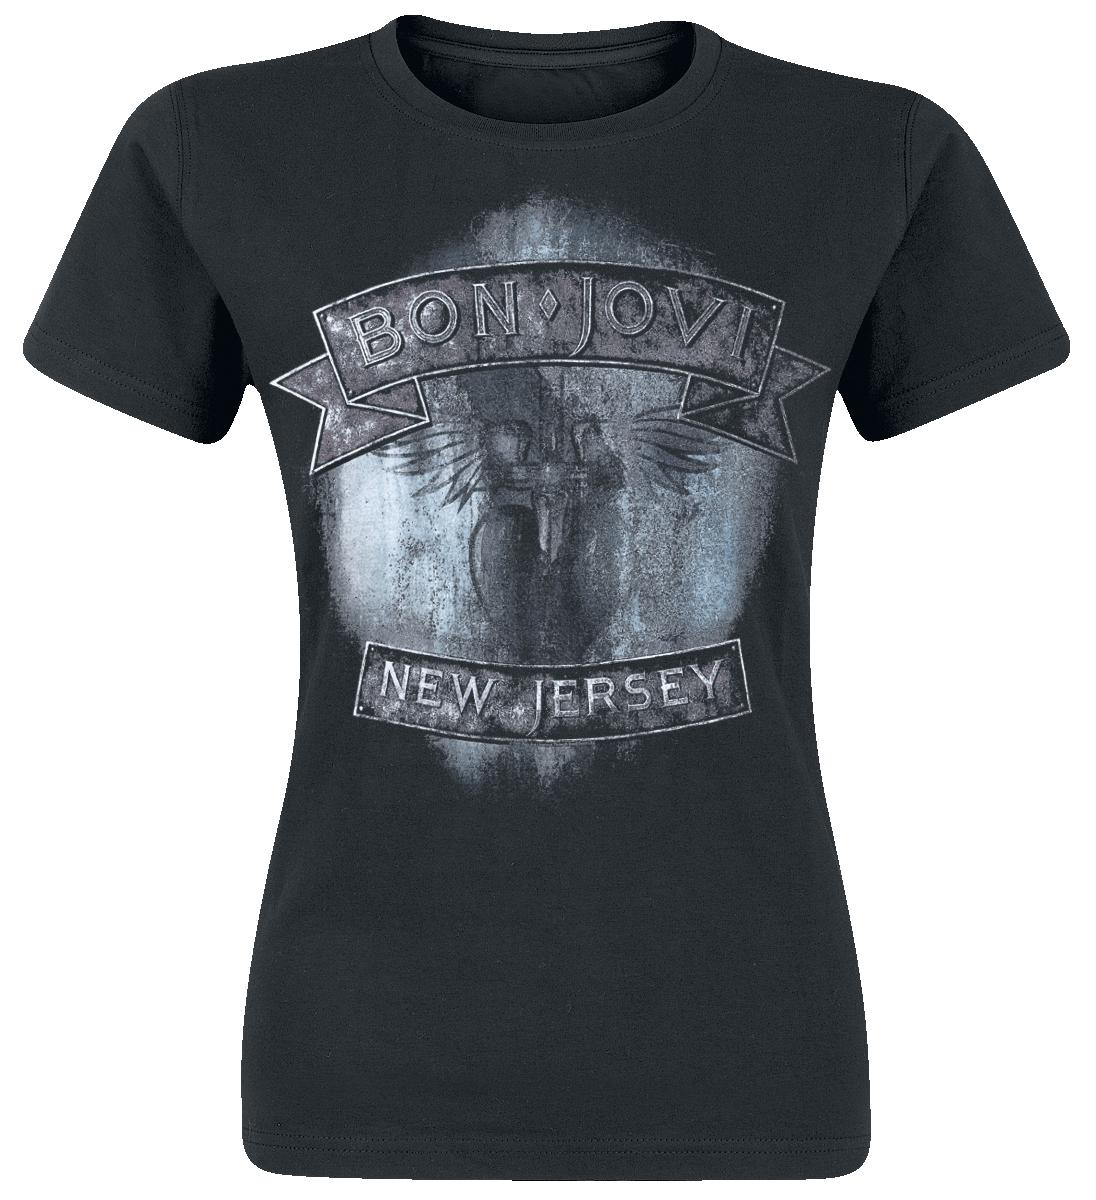 Bon Jovi - New Jersey - T-Shirt - schwarz